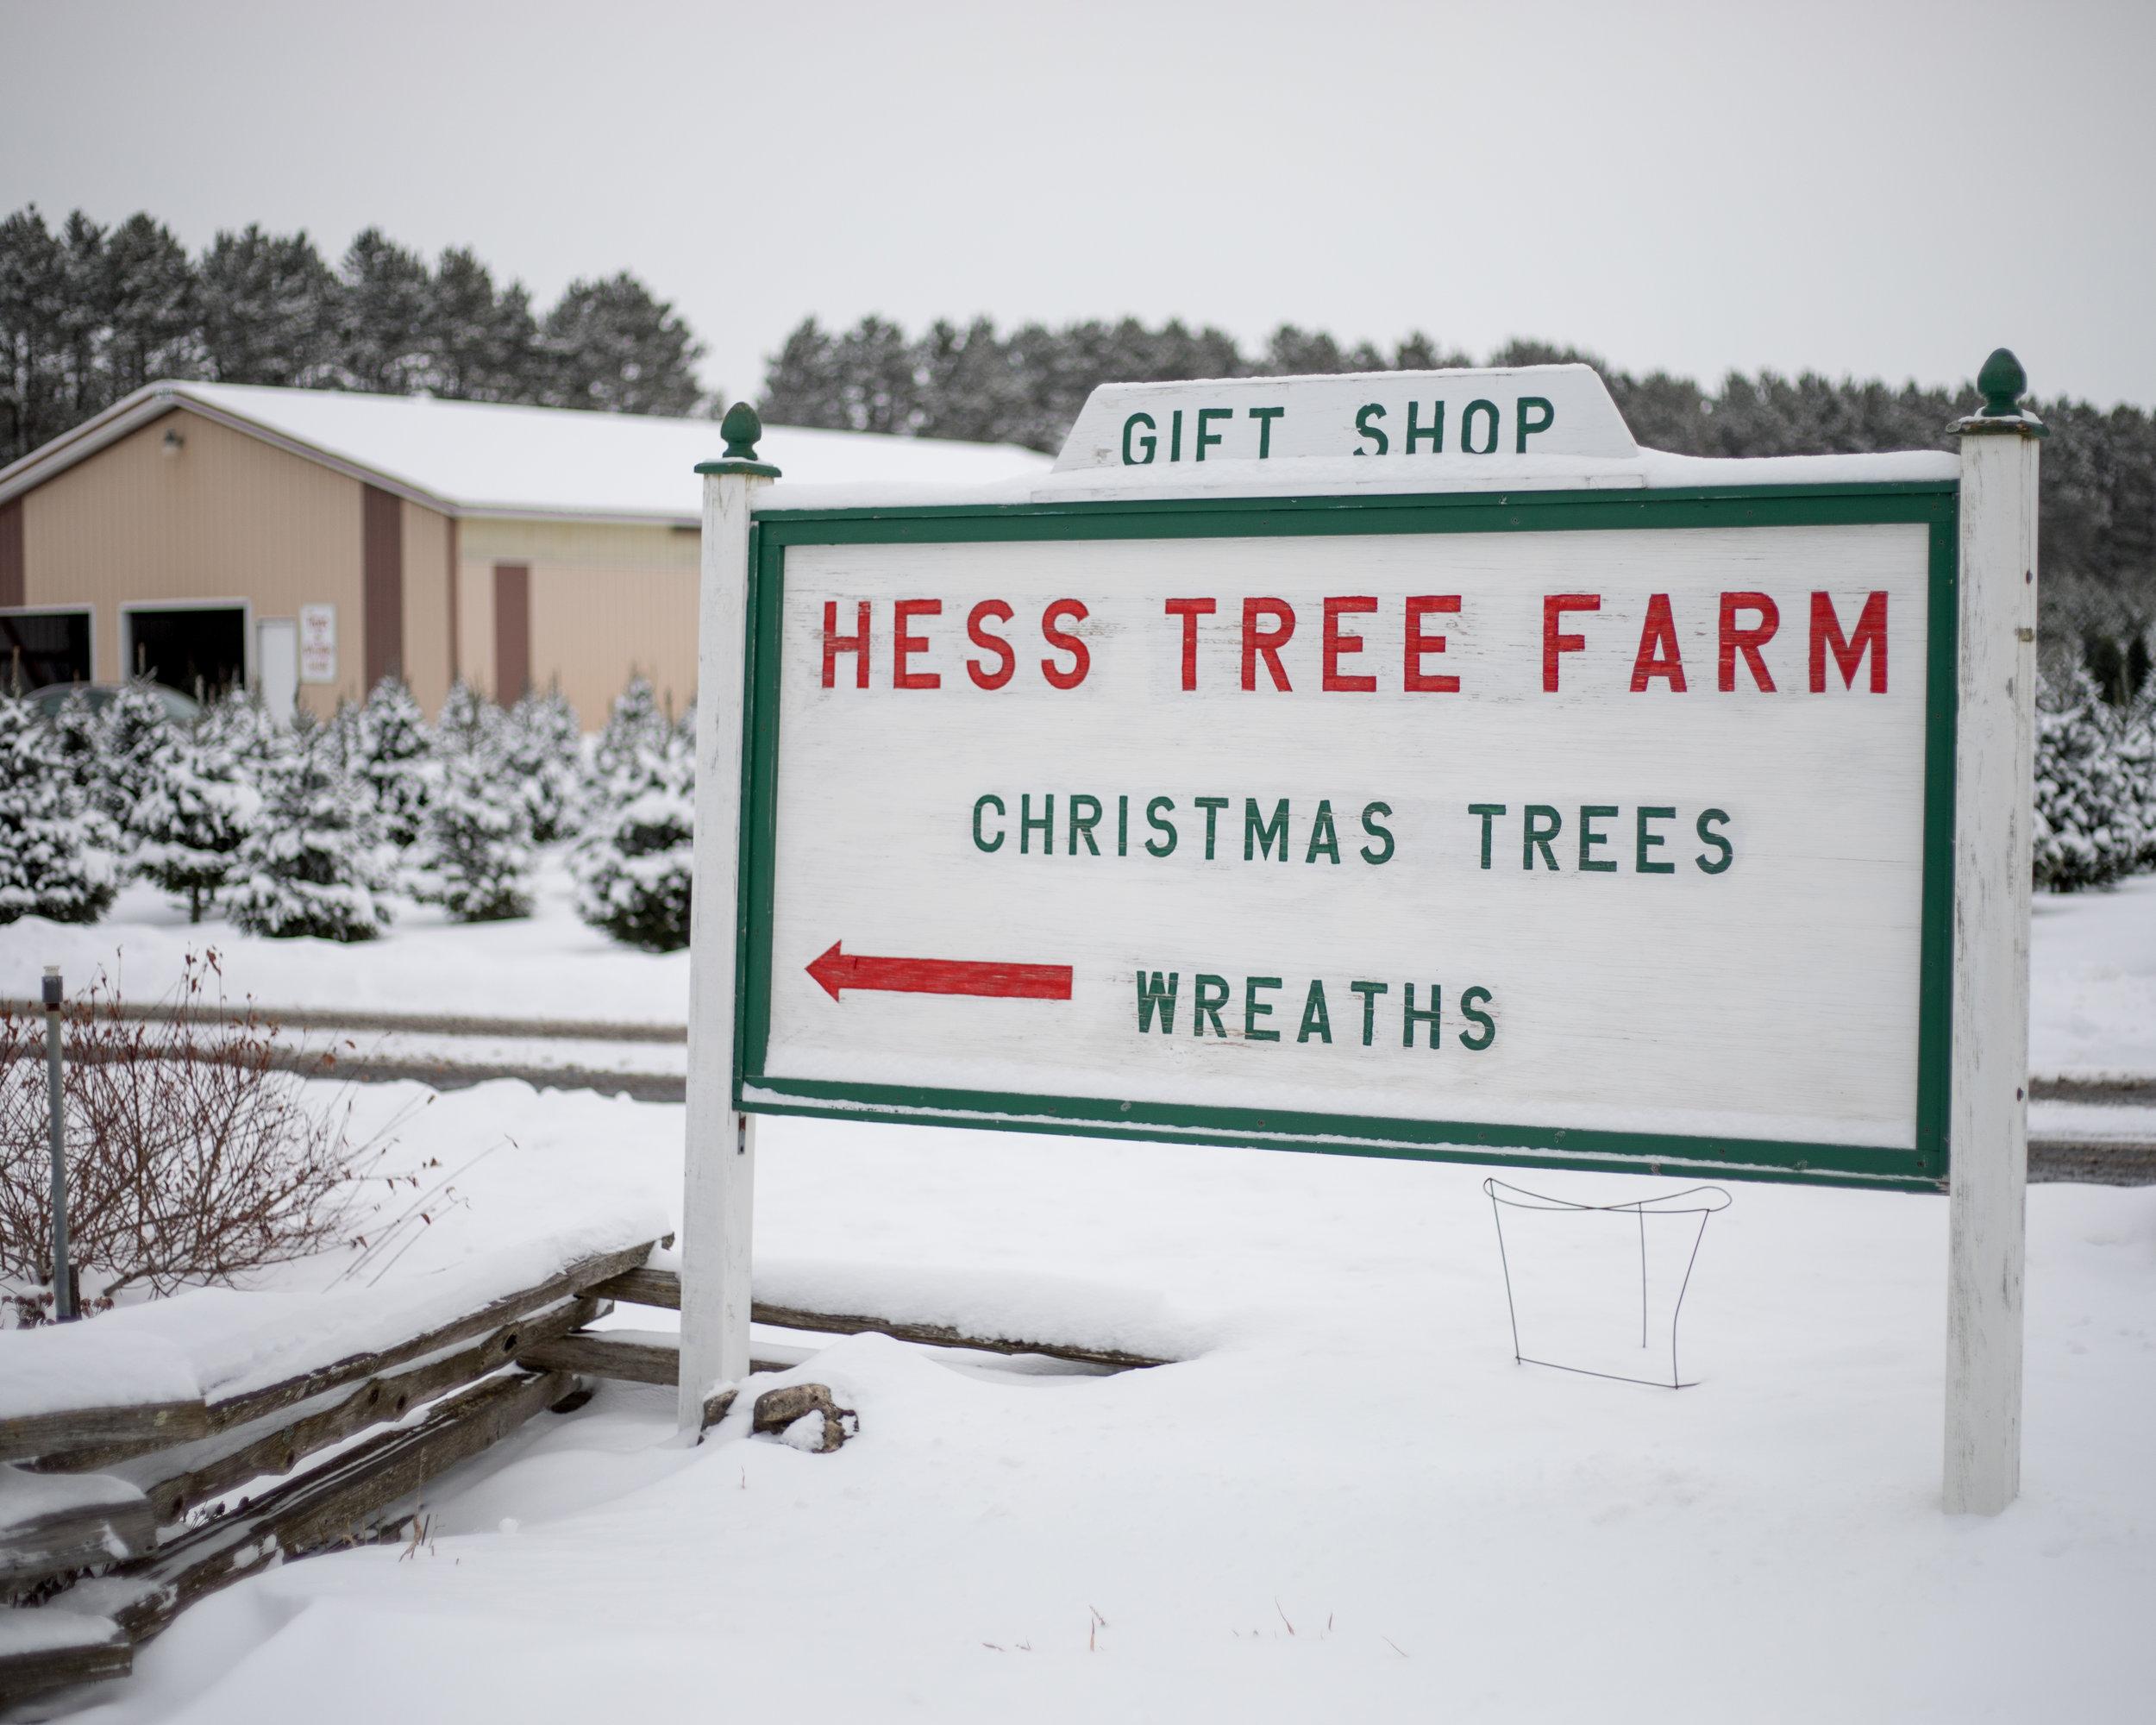 Hess Christmas Tree Farm -Wisconsin Rapids, WI